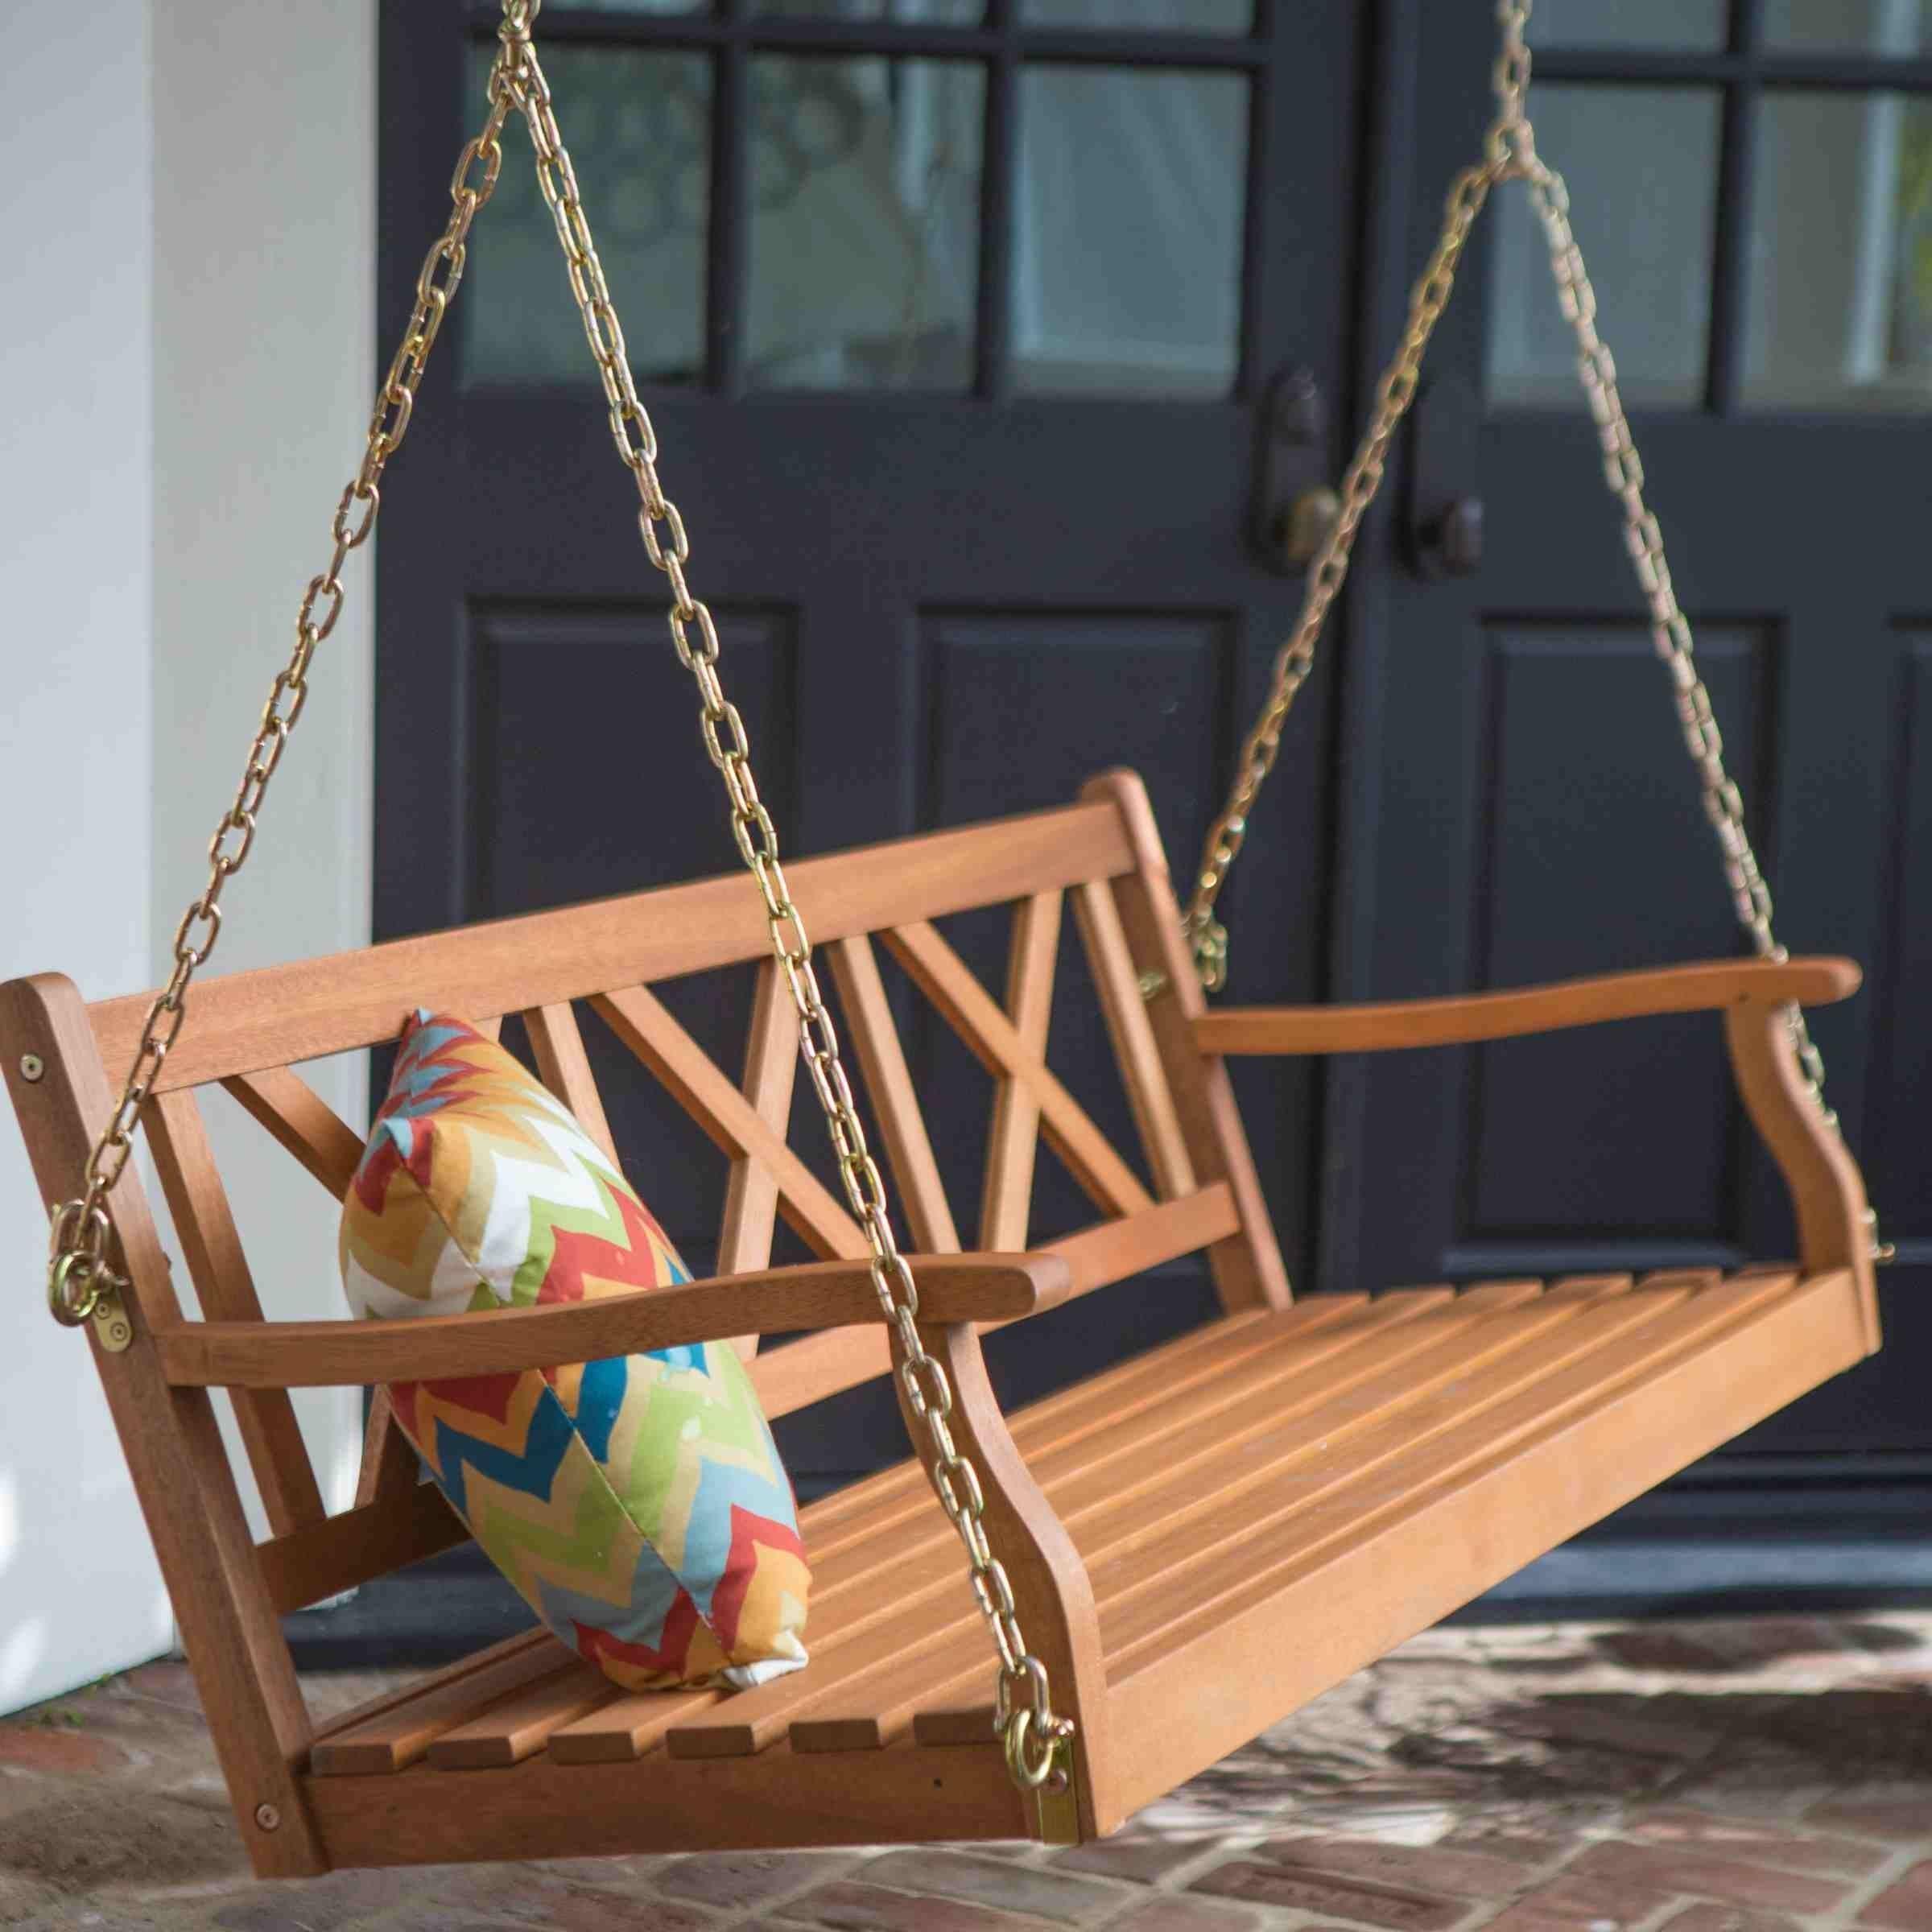 ftoutdoor garden backyard wood porch swings comes with free